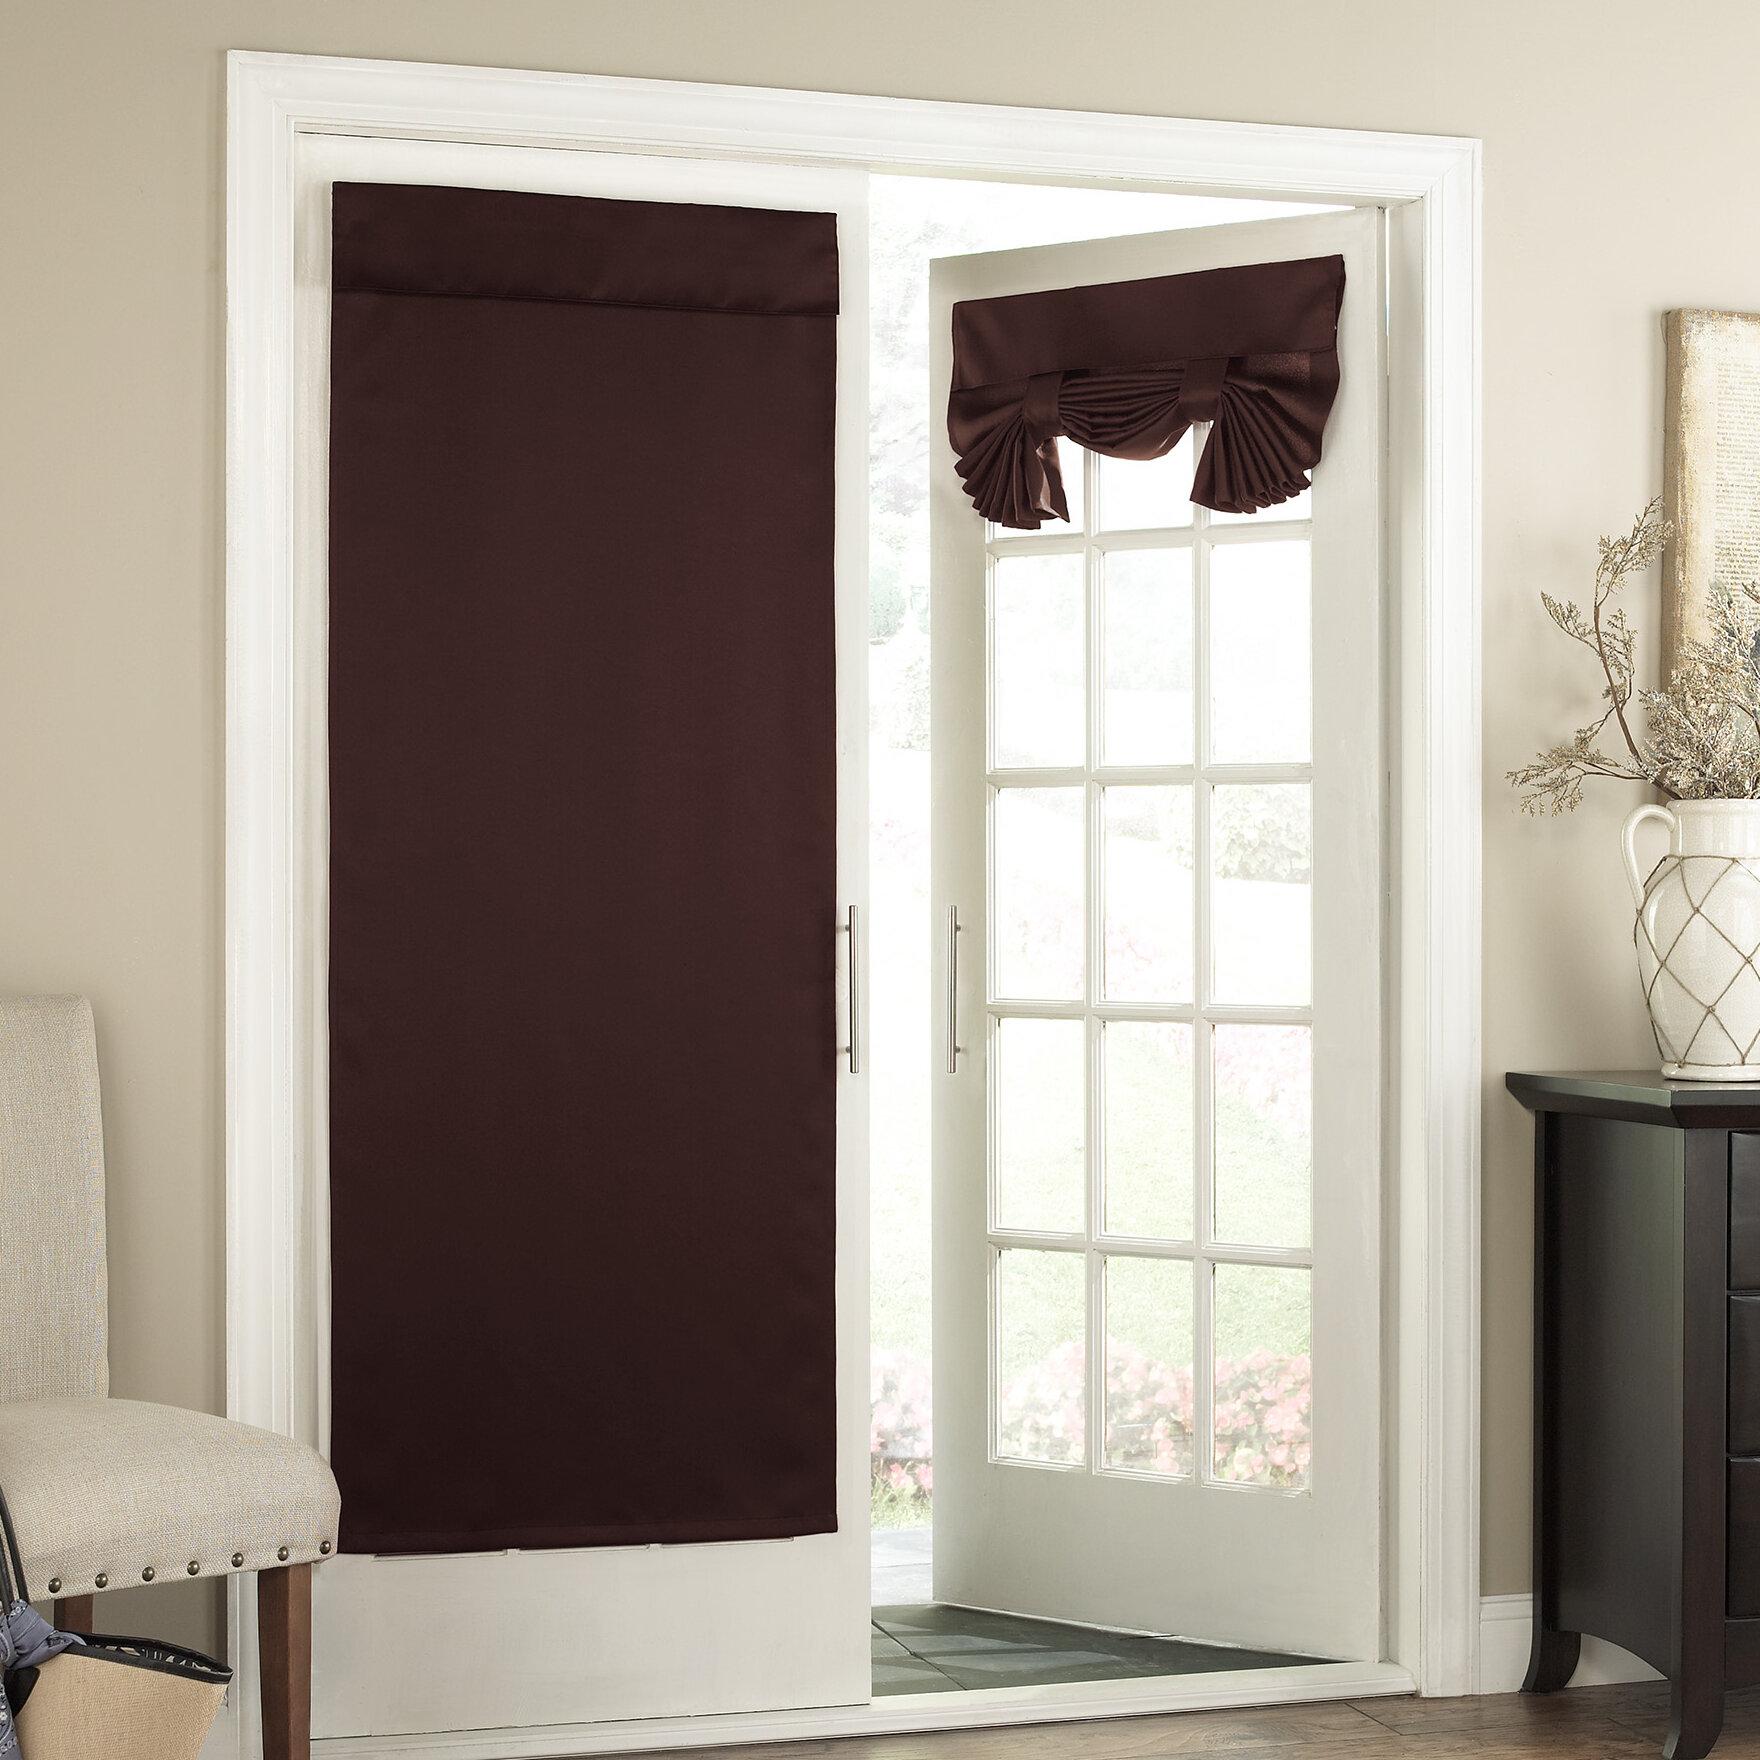 Charlton Home Cantor Solid Room Darkening Tab Top Window Door Panel Reviews Wayfair